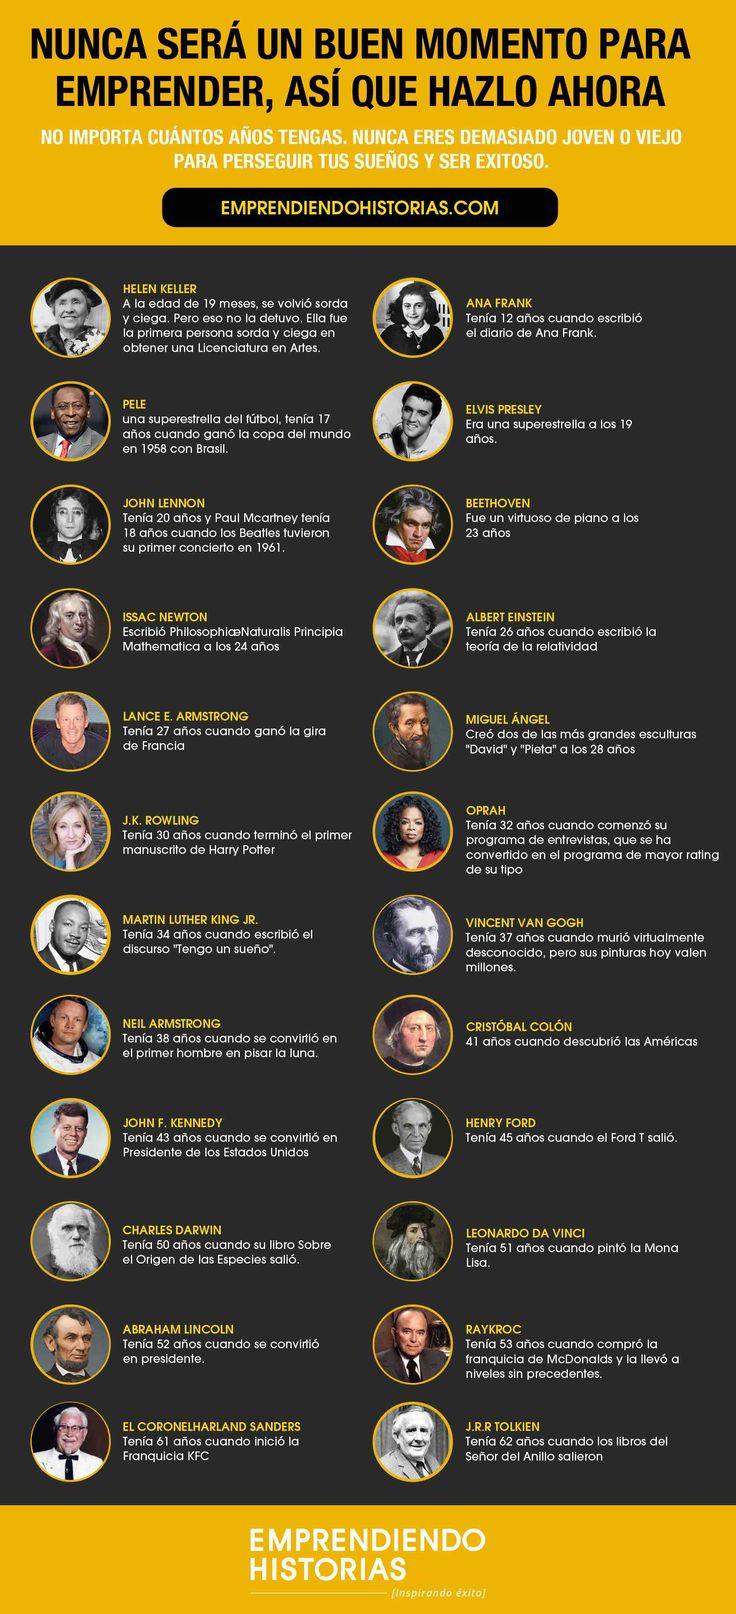 Empresarios exitosos, emprendedores, personajes exitosos, momento para emprender